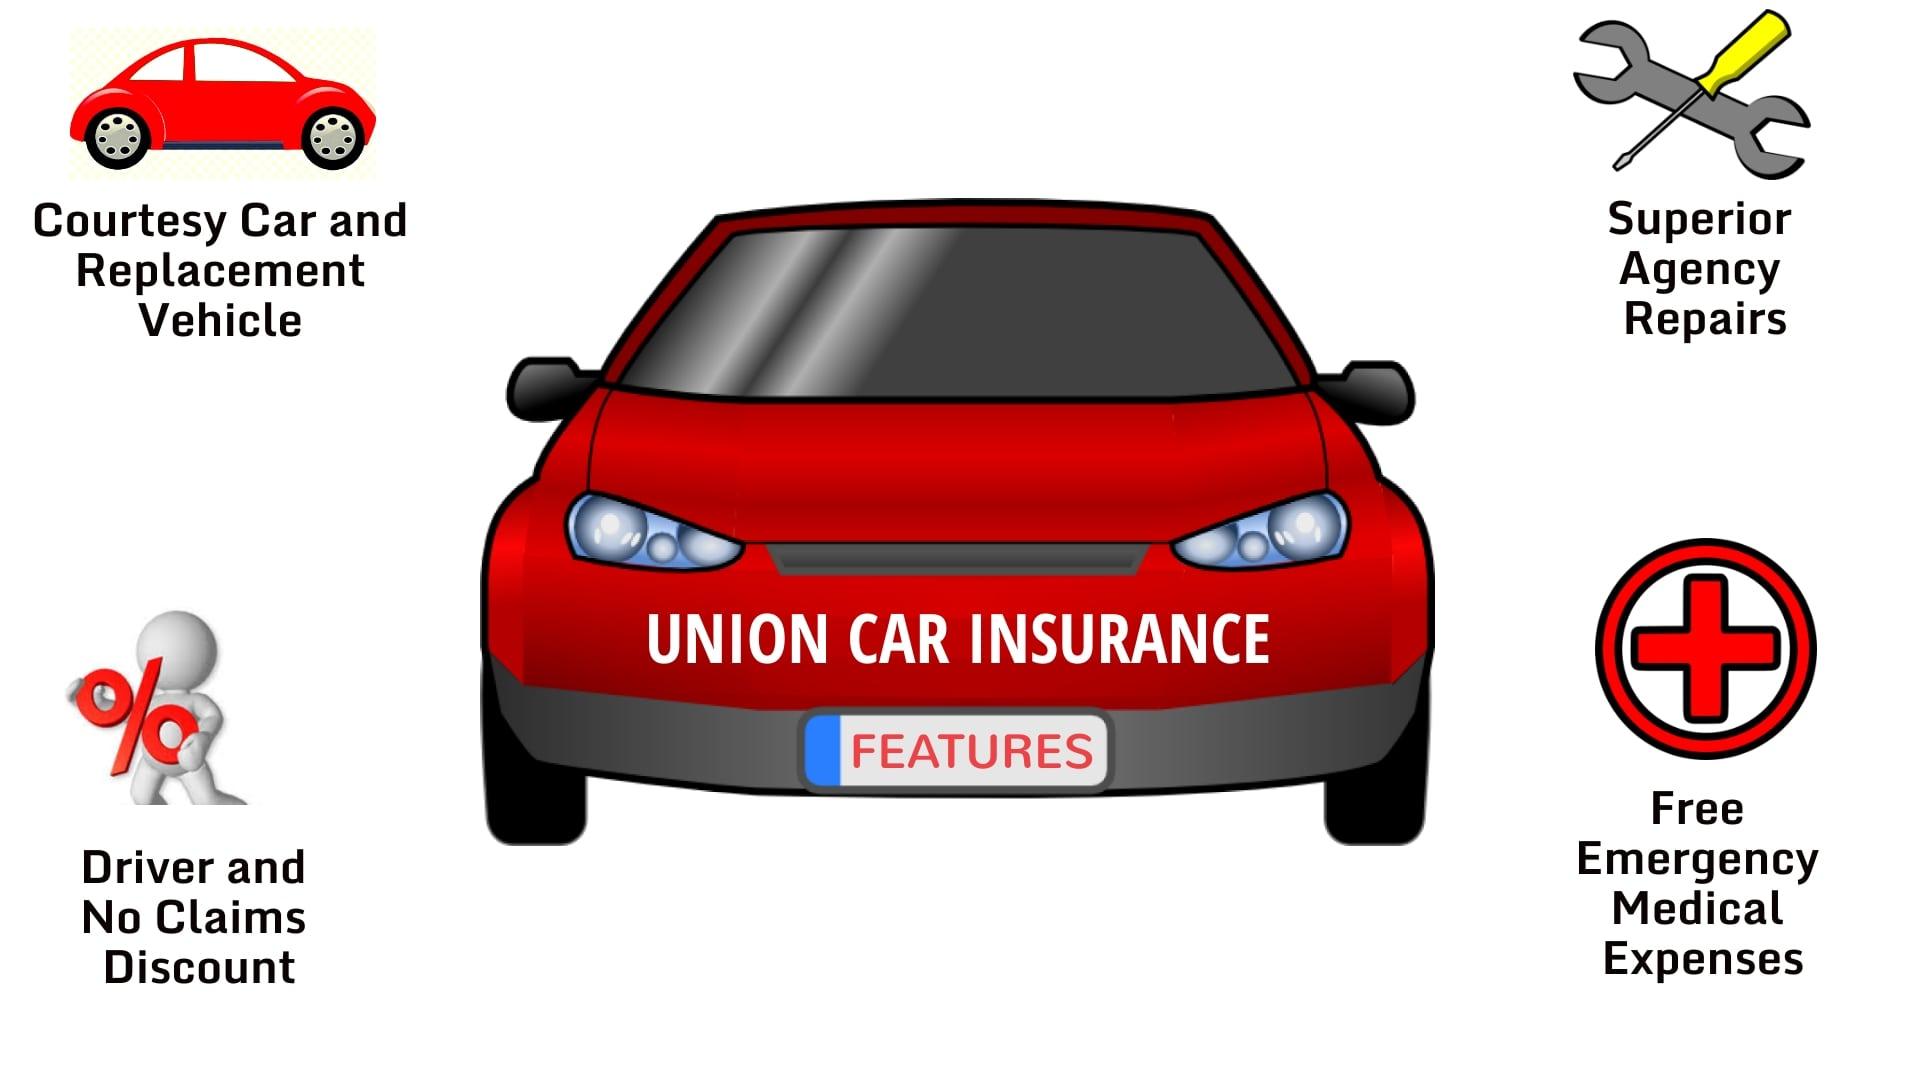 Union Car Insurance